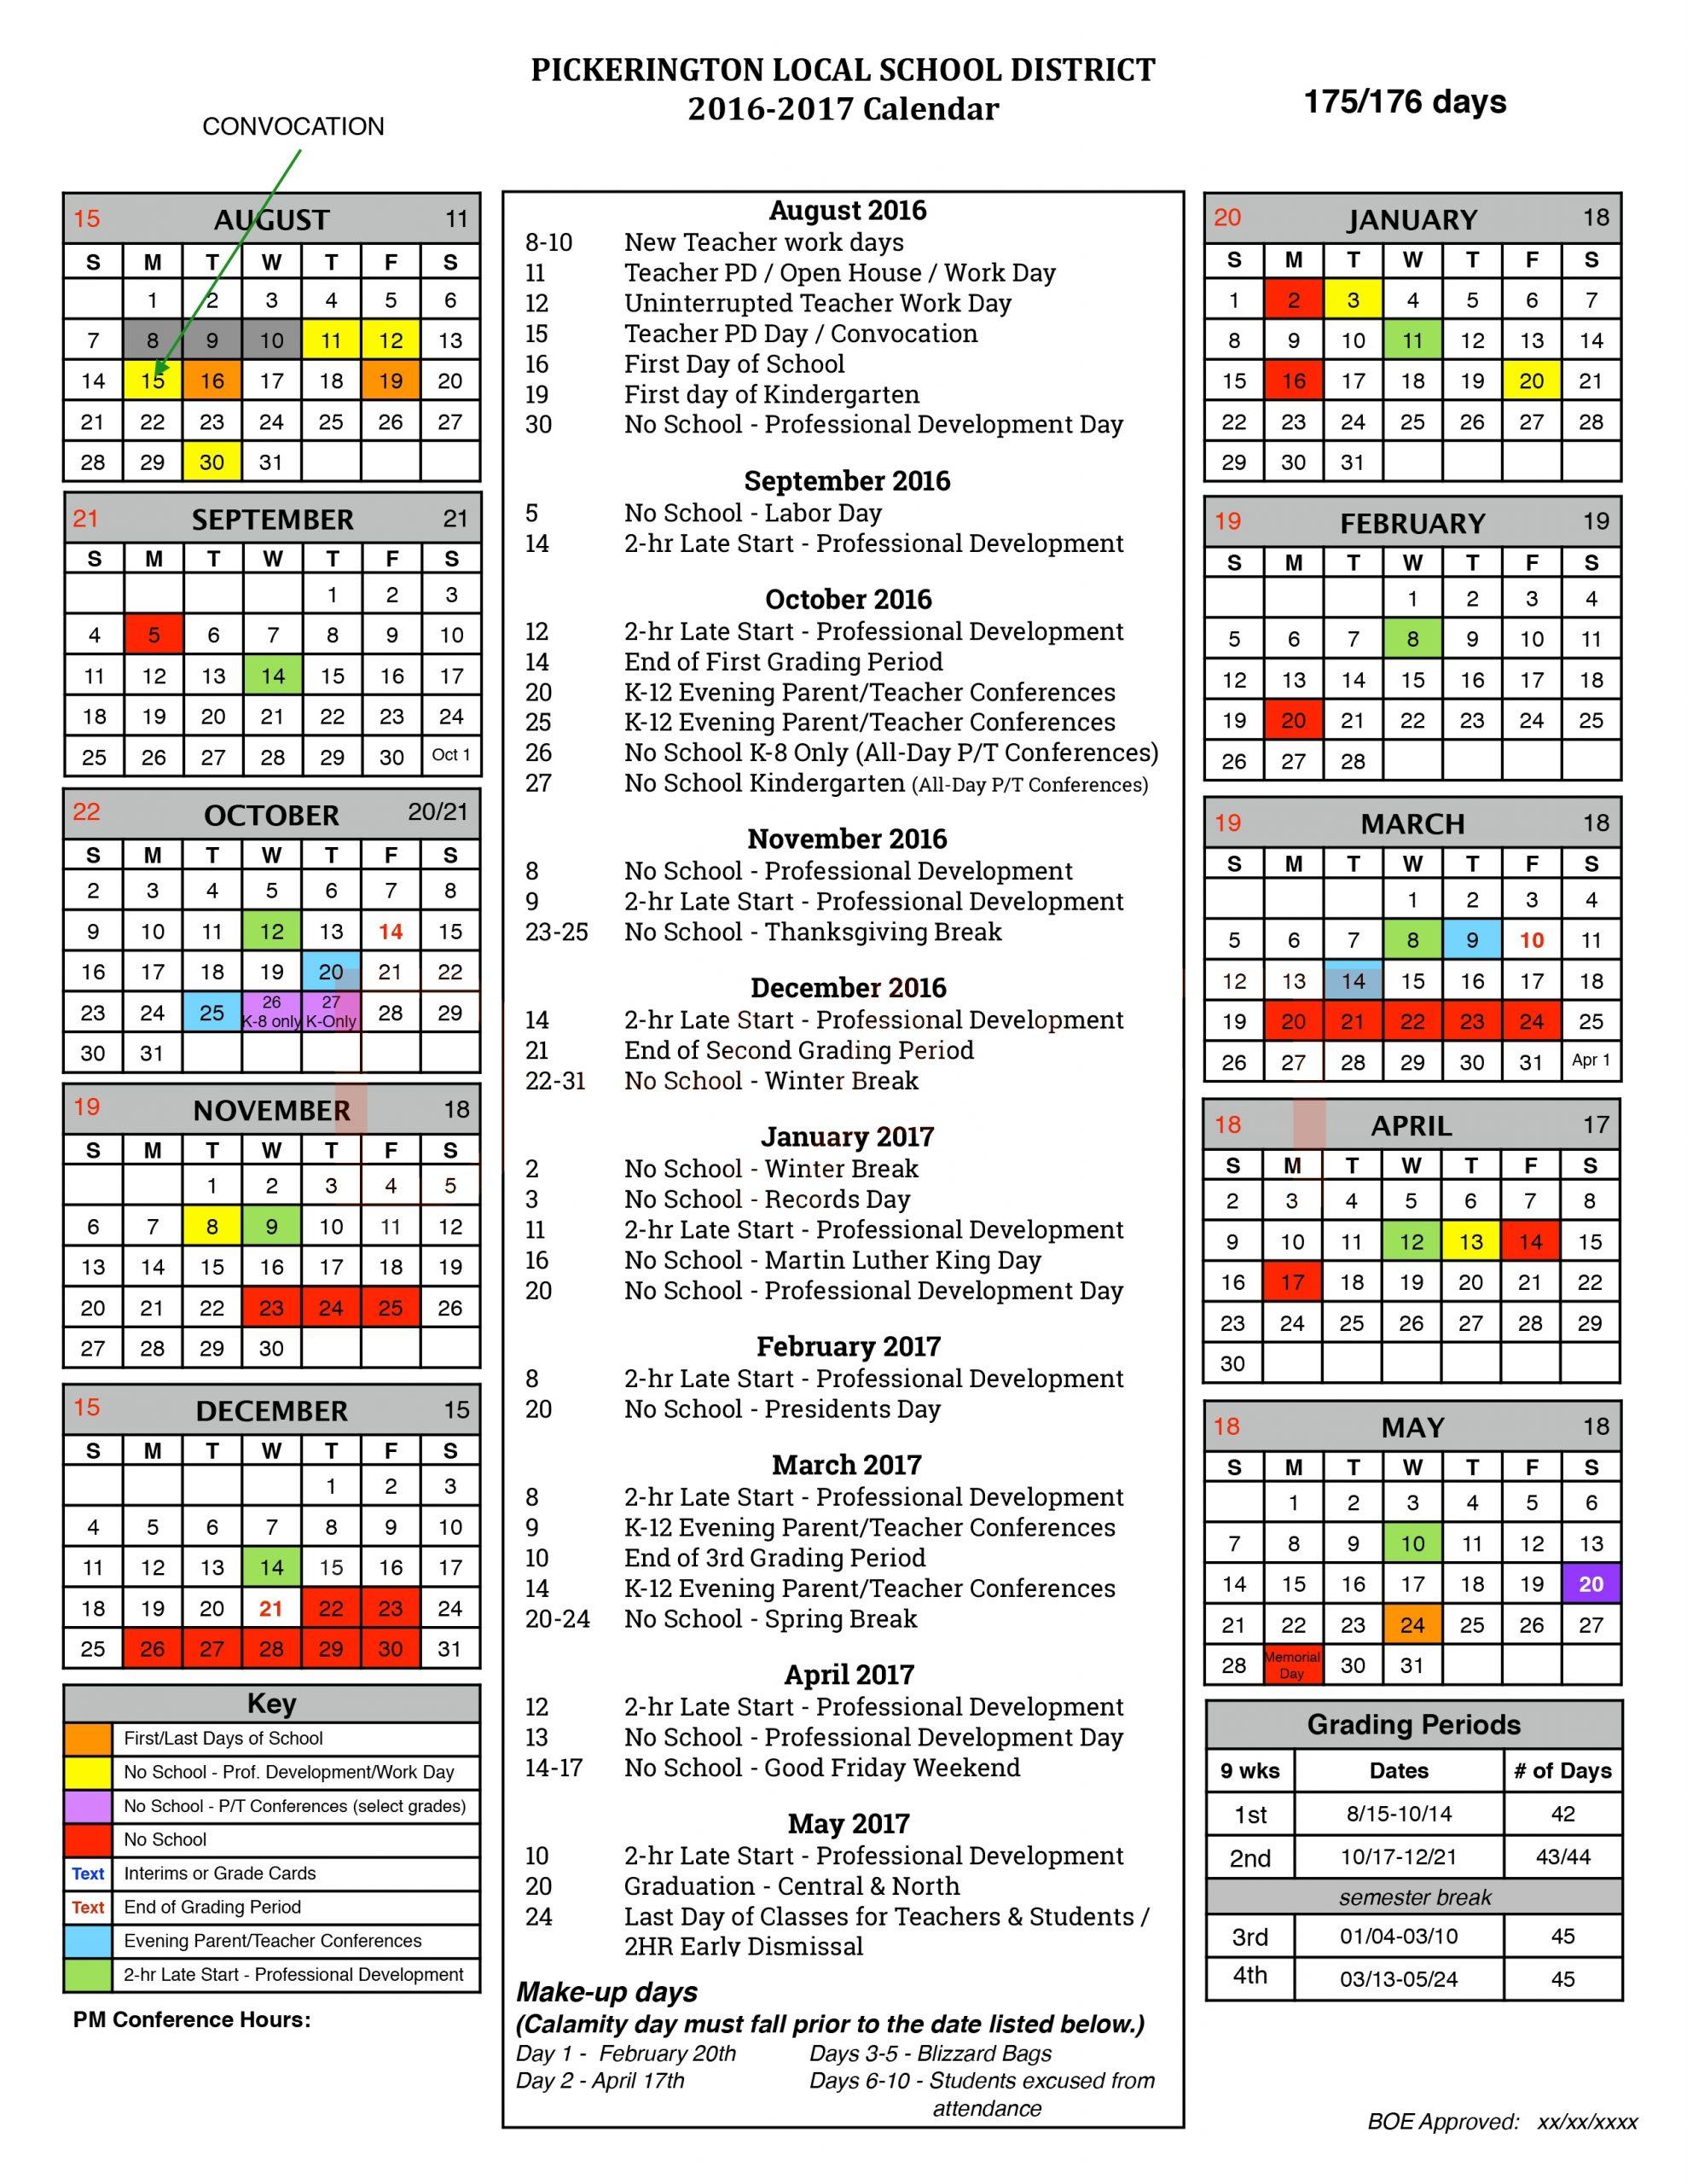 School Board Oks 2016-17 Calendar - Pickerington Local School District